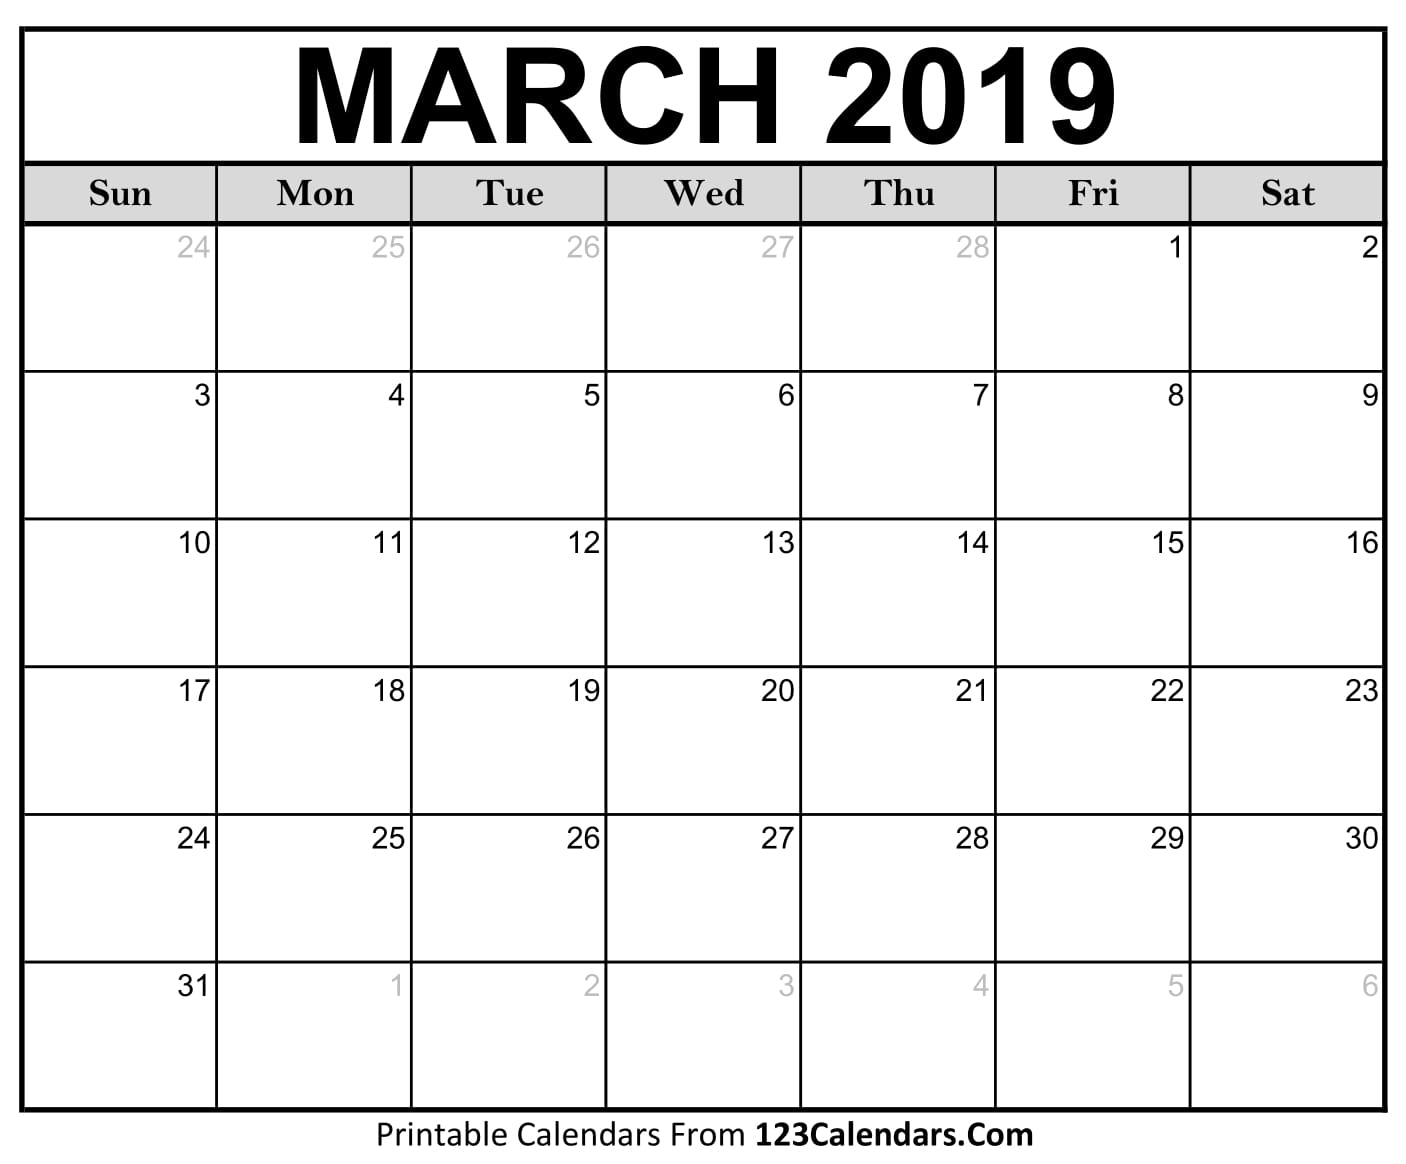 Blank Calendar Of March : Printable march calendar templates calendars